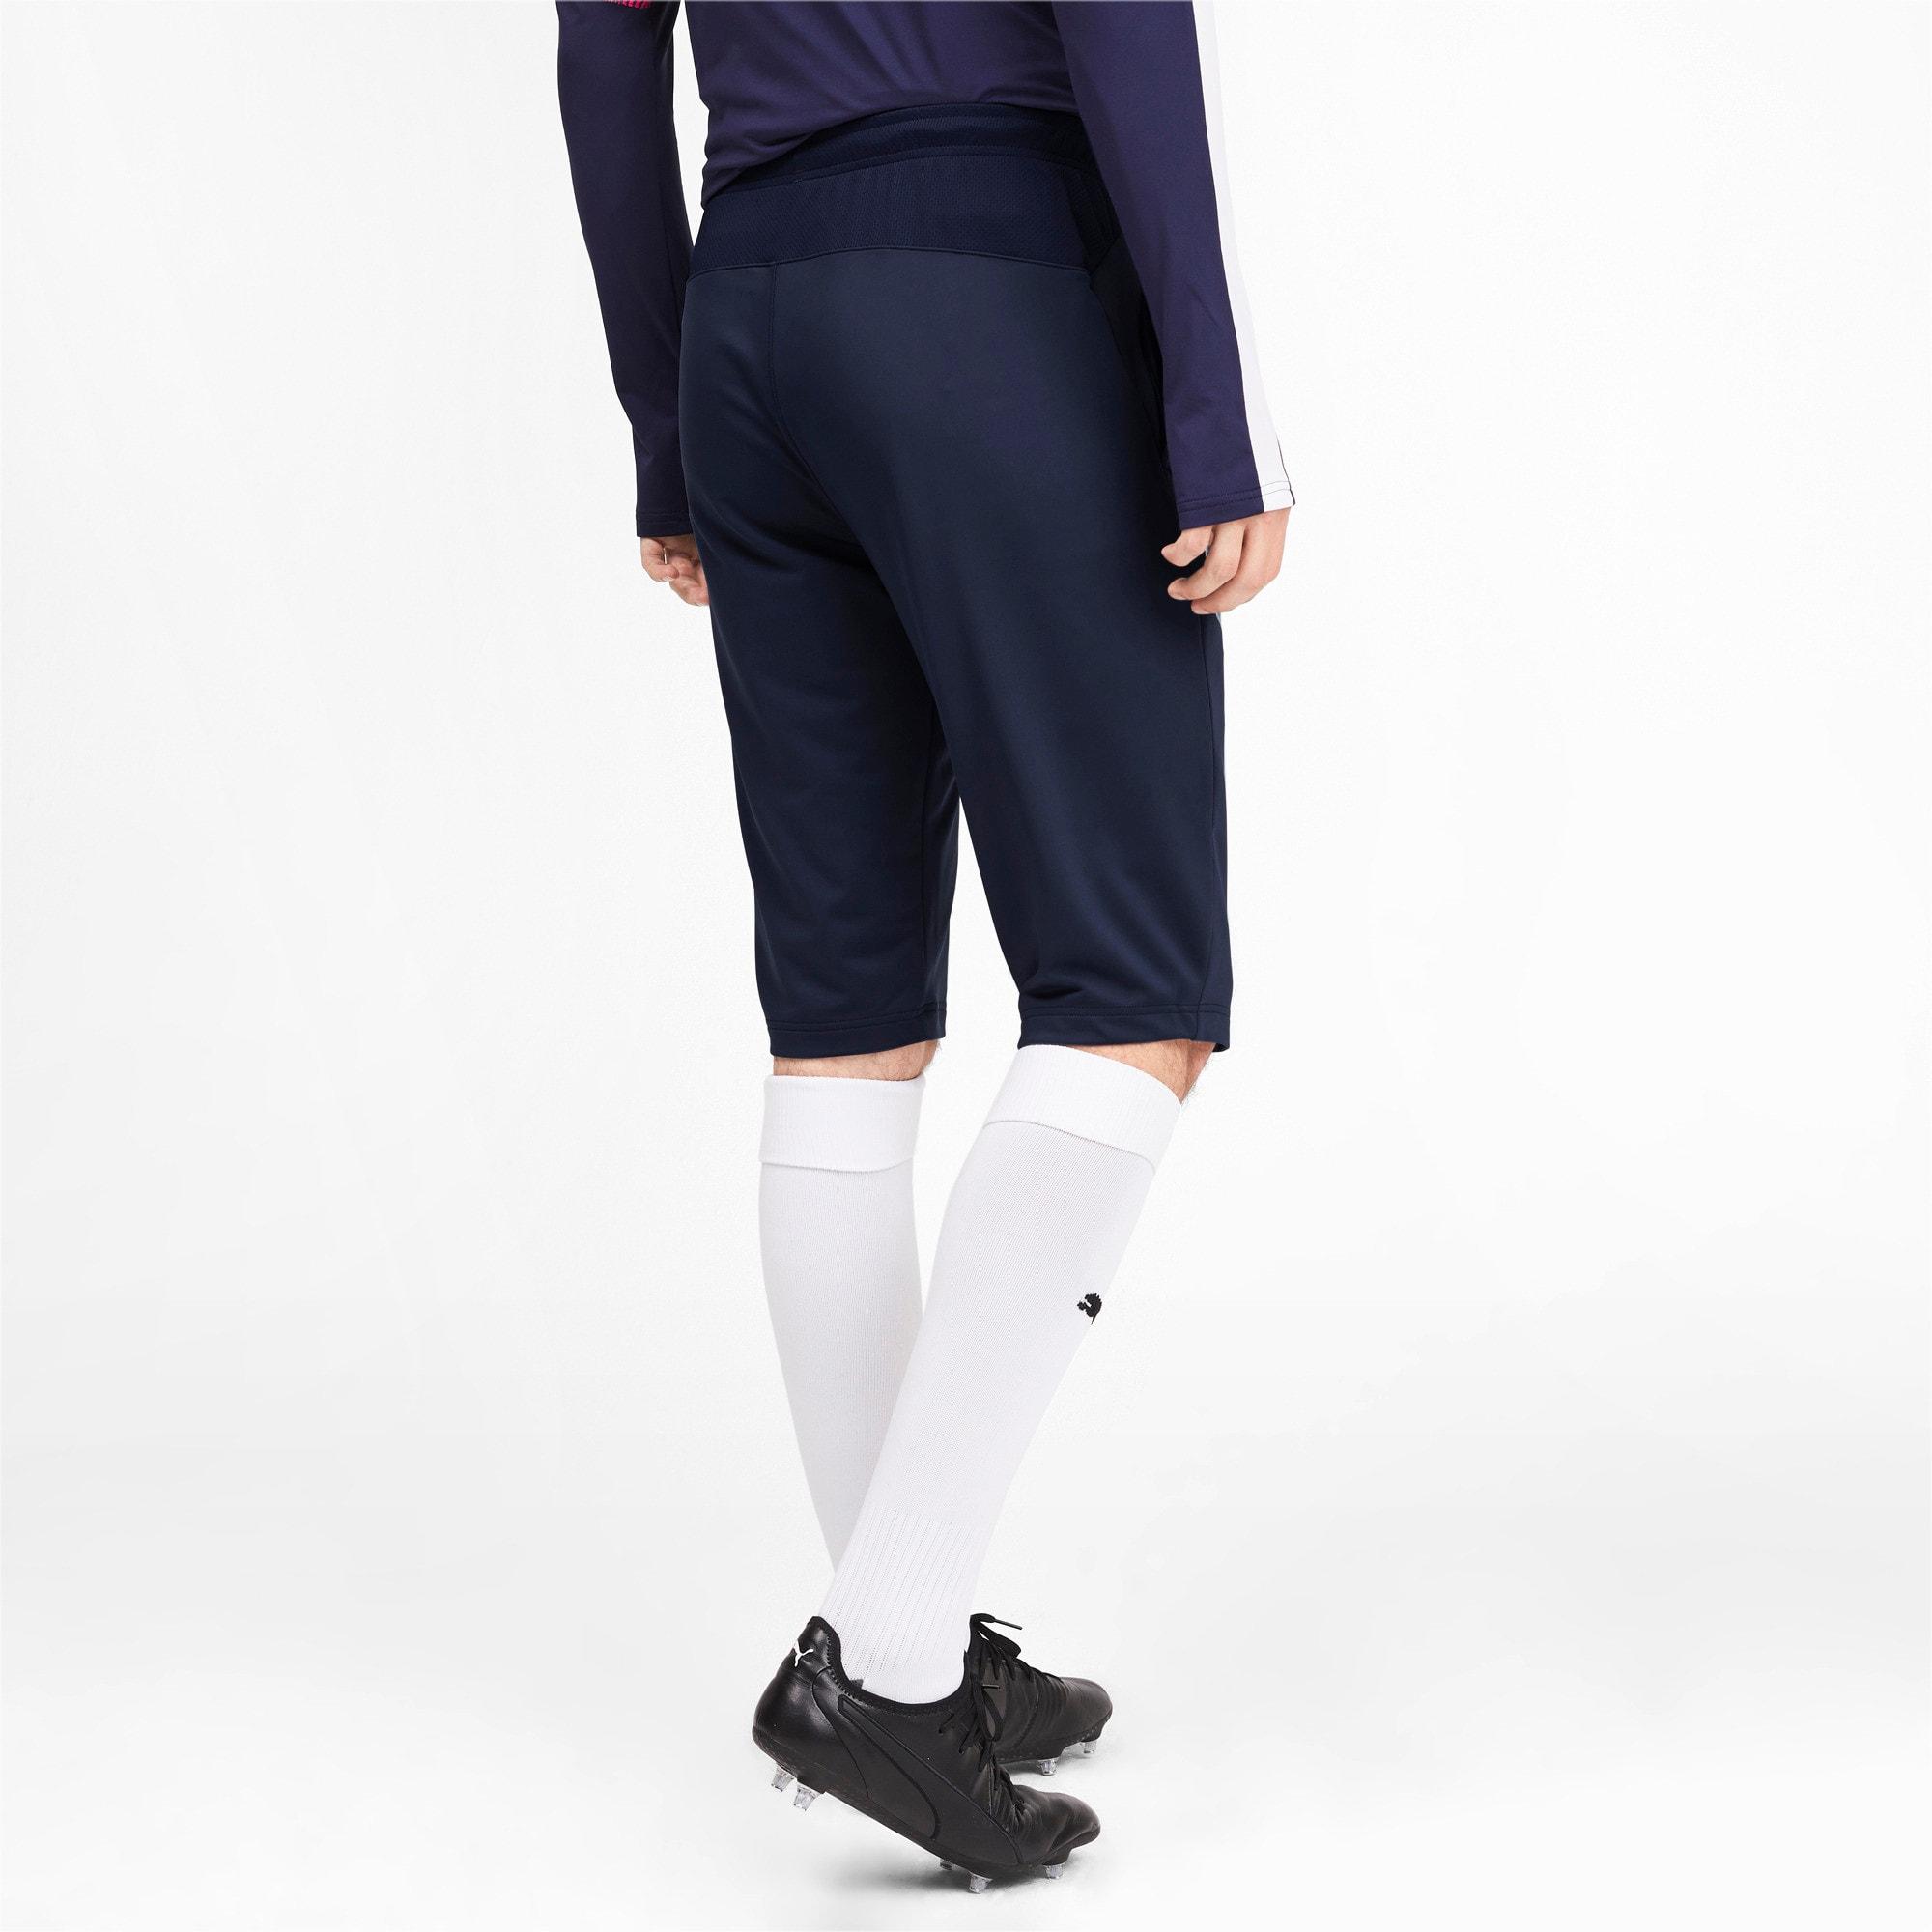 Thumbnail 3 of Chivas Men's 3/4 Training Pants, Peacoat, medium